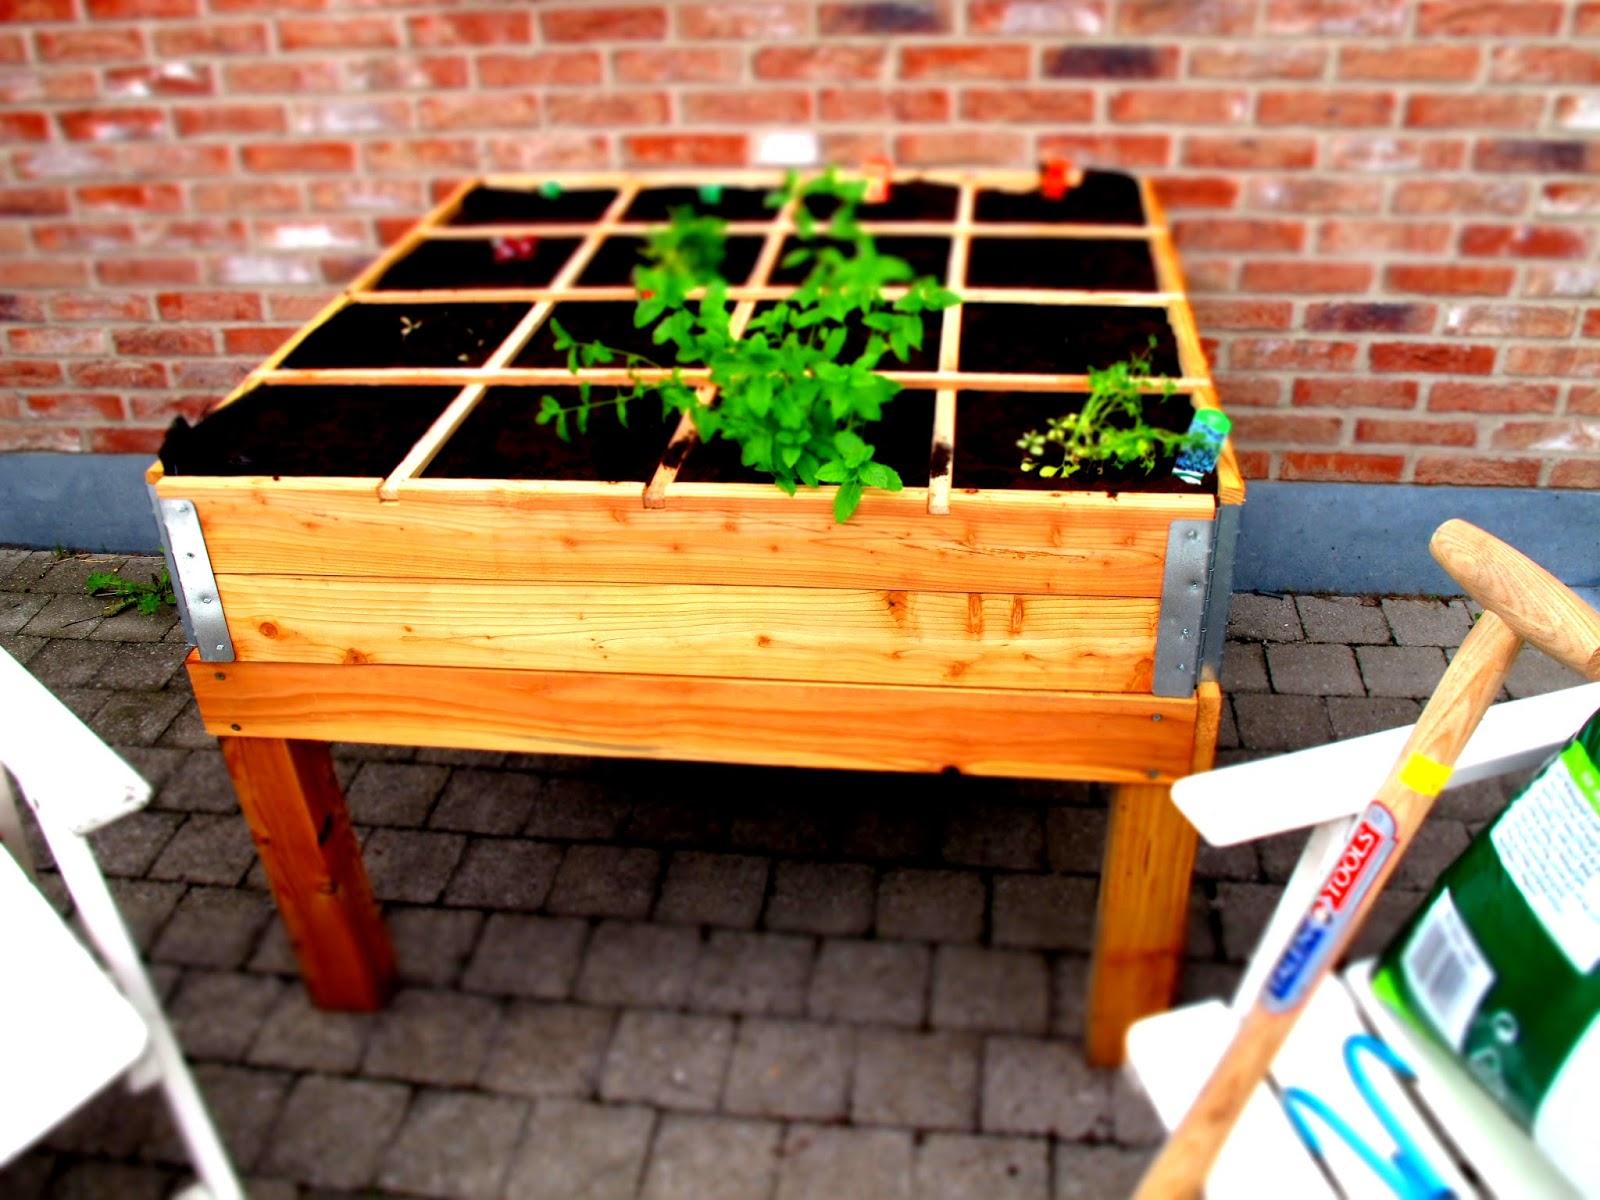 Vierkante Meter Tuin : Vierkante meter tuin